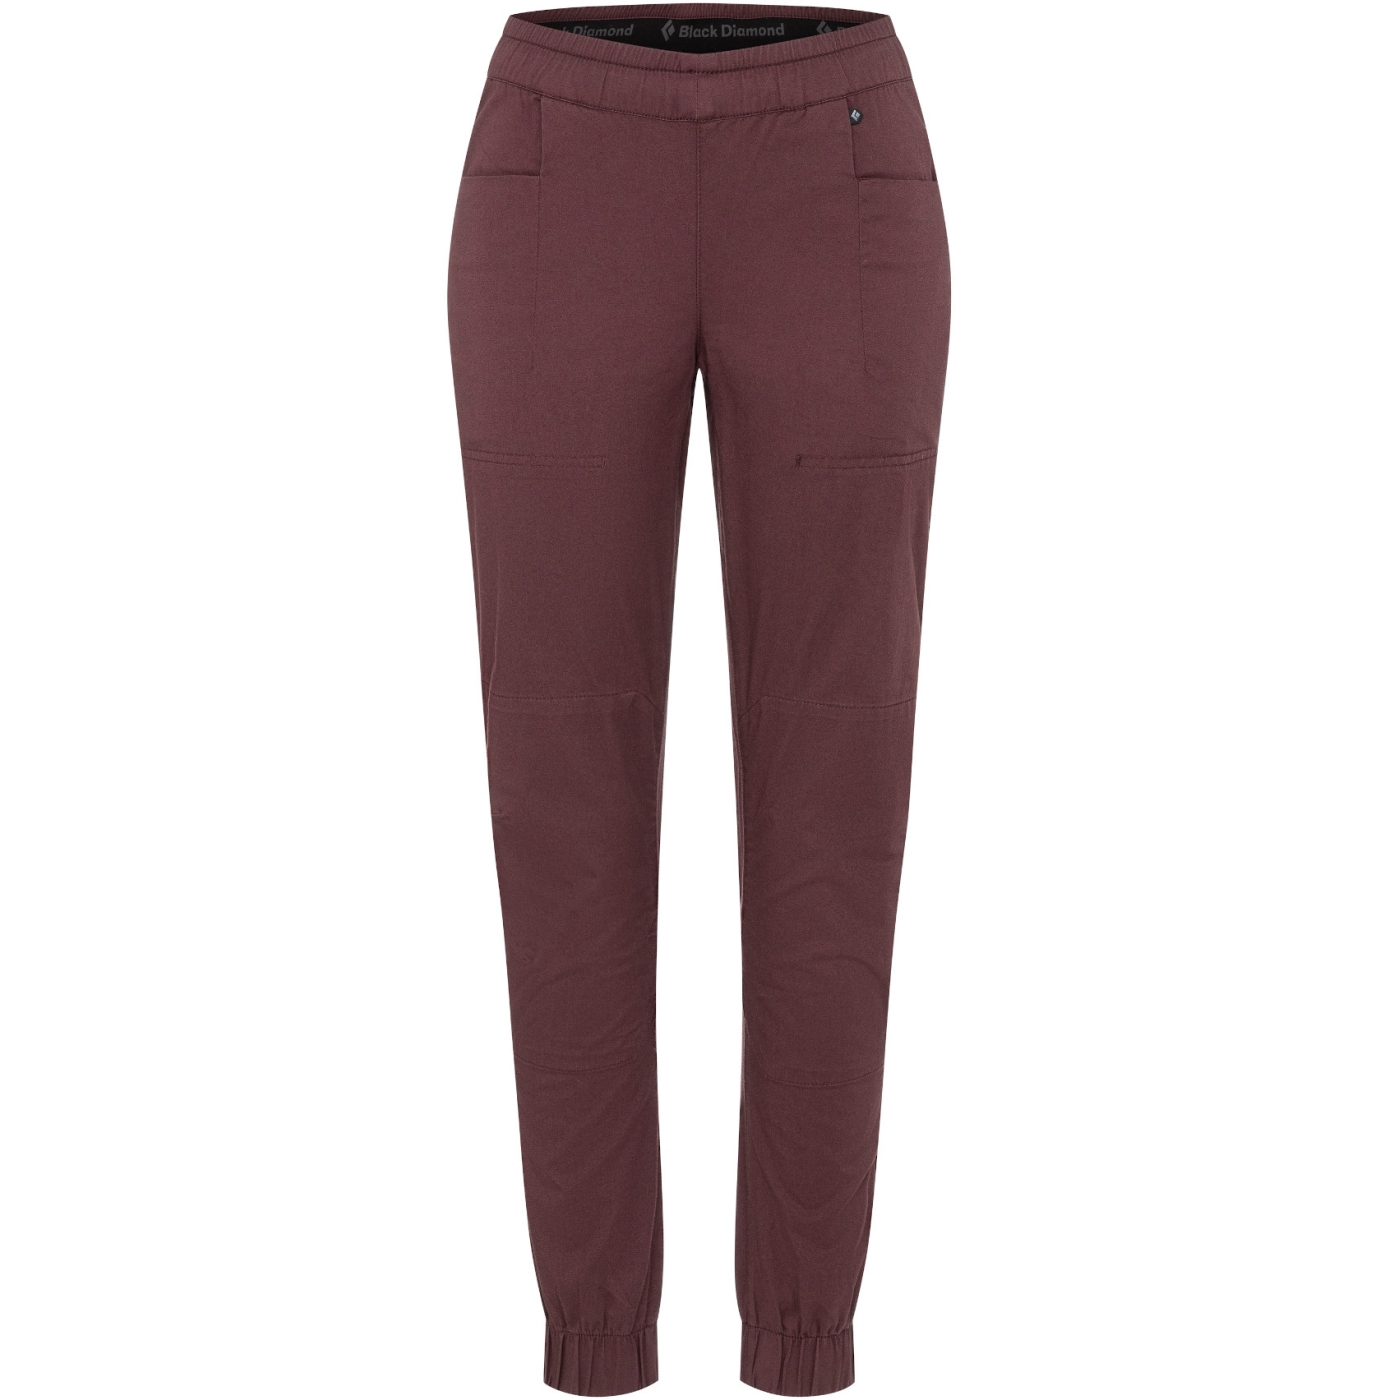 Black Diamond Notion SP Pants Womens - Port